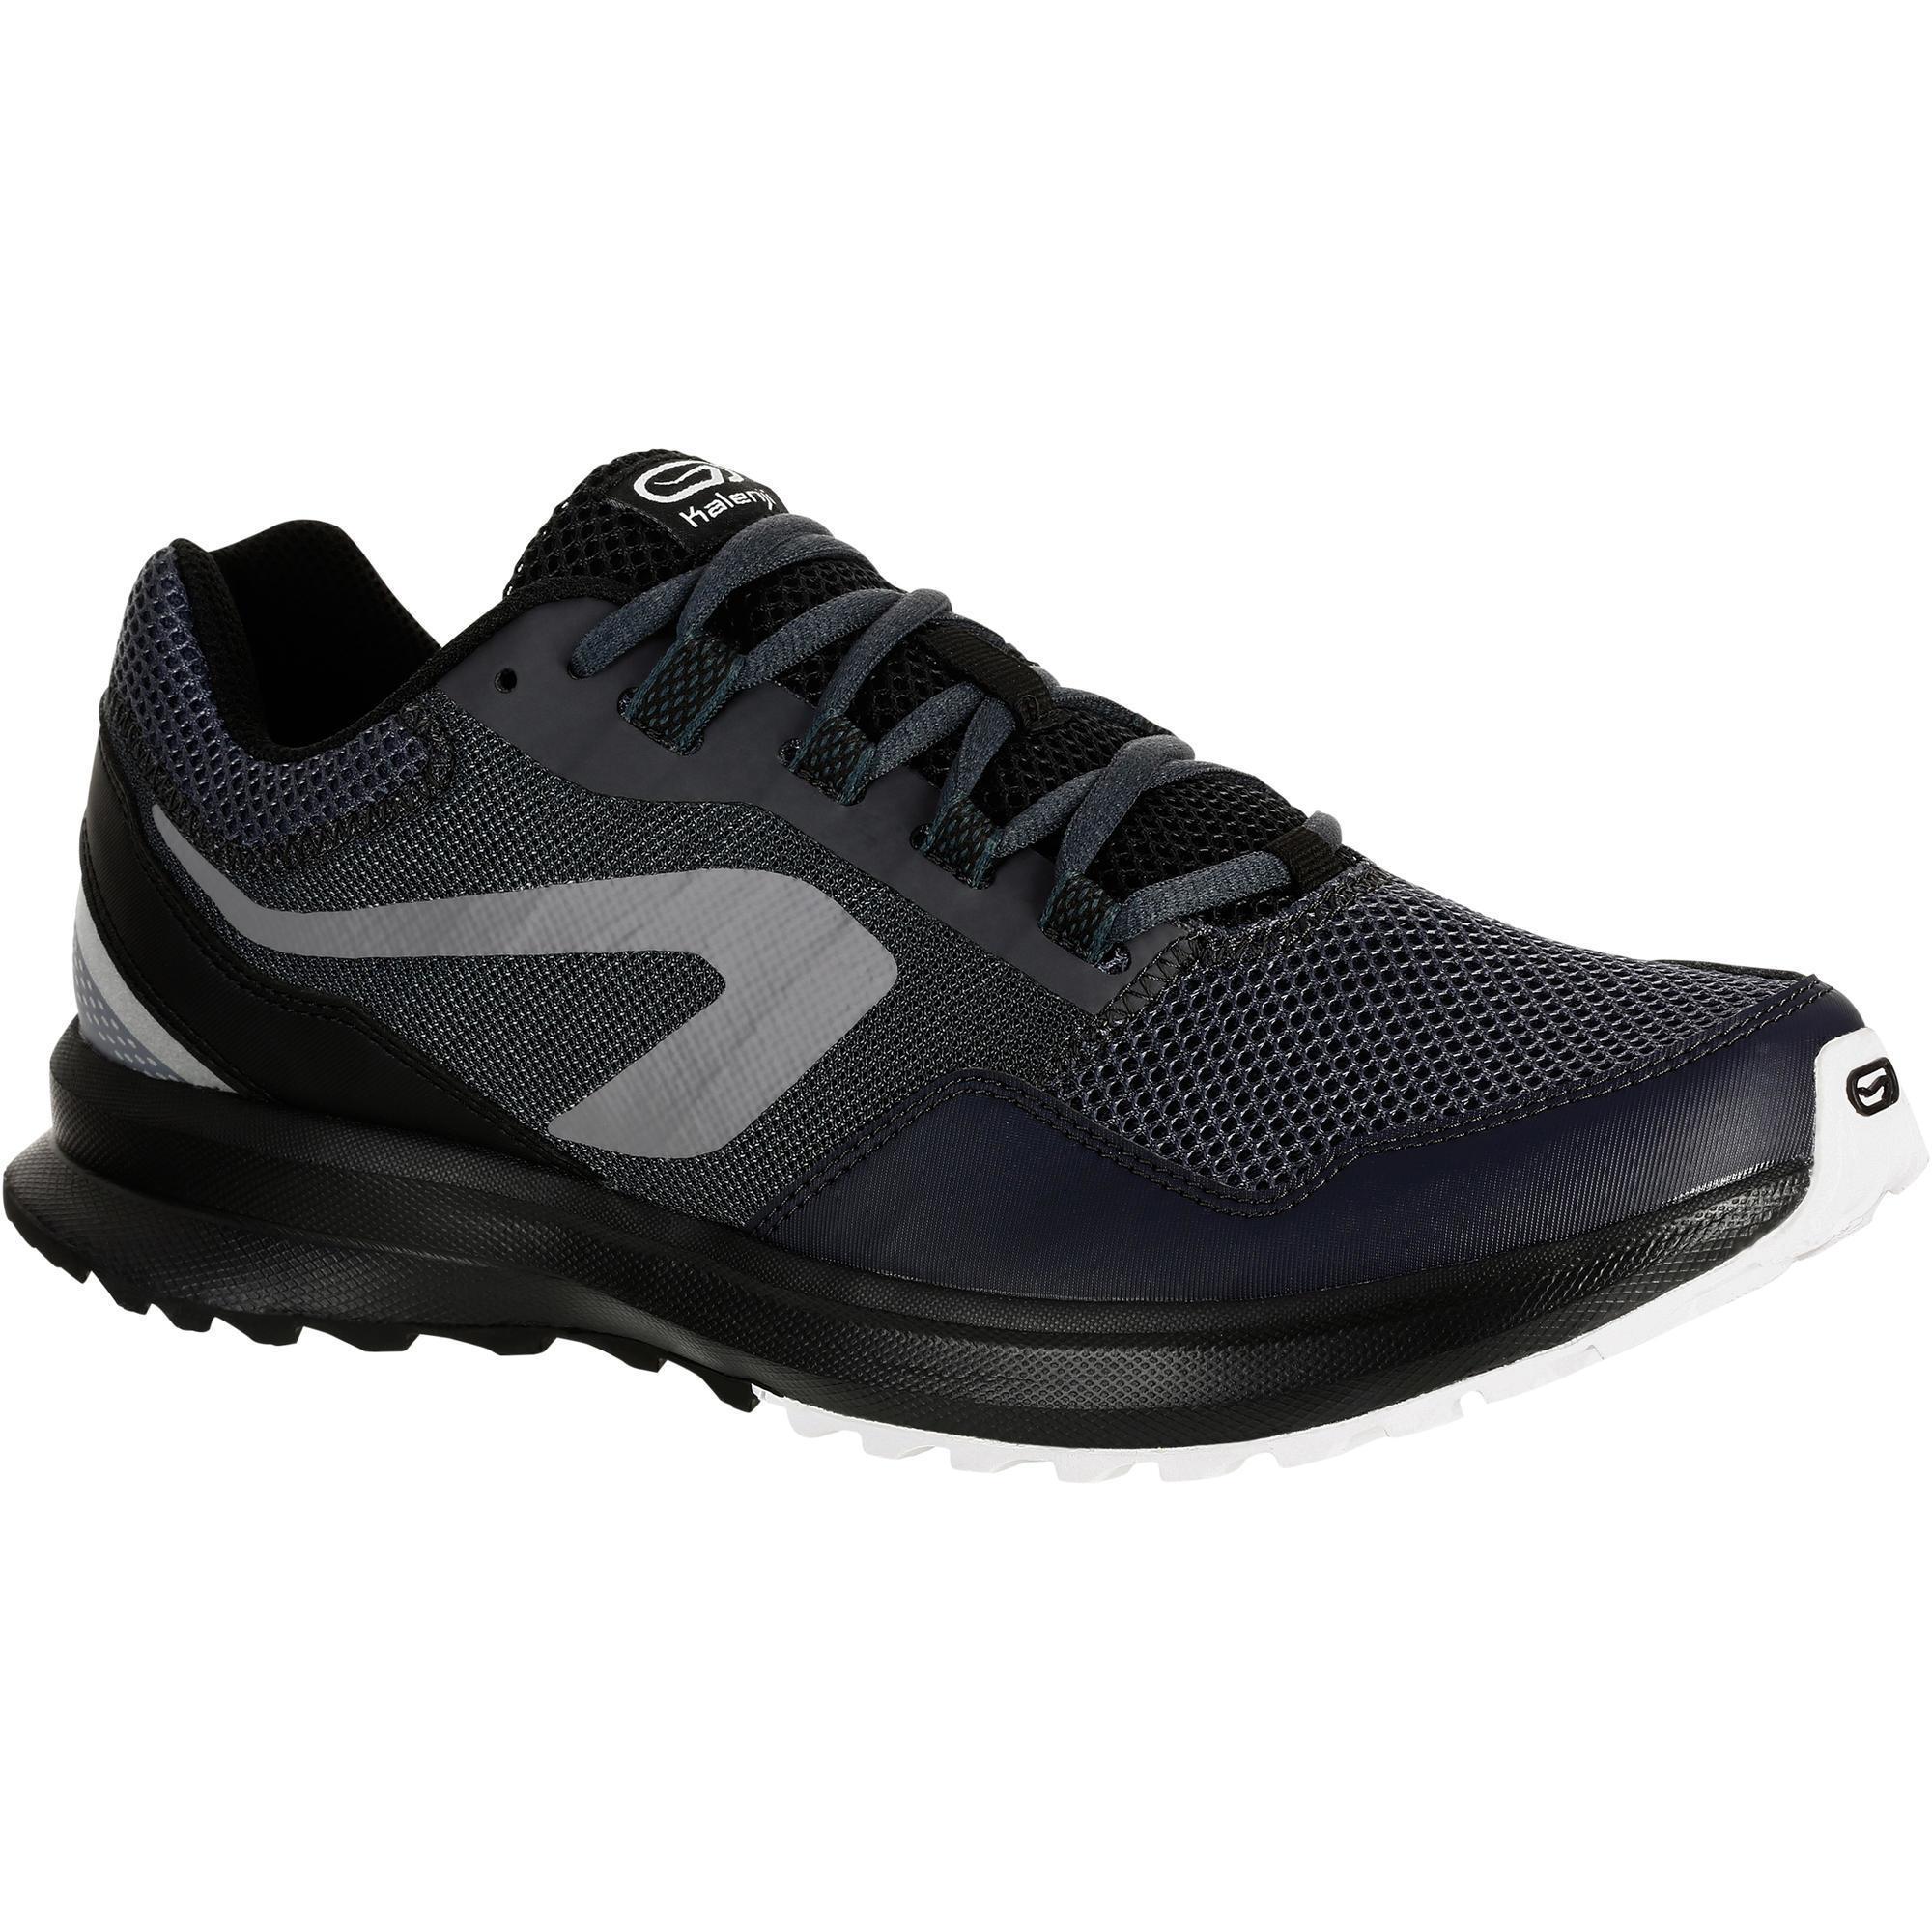 Laufschuhe Run Active Grip Herren | Schuhe > Sportschuhe > Laufschuhe | Kalenji